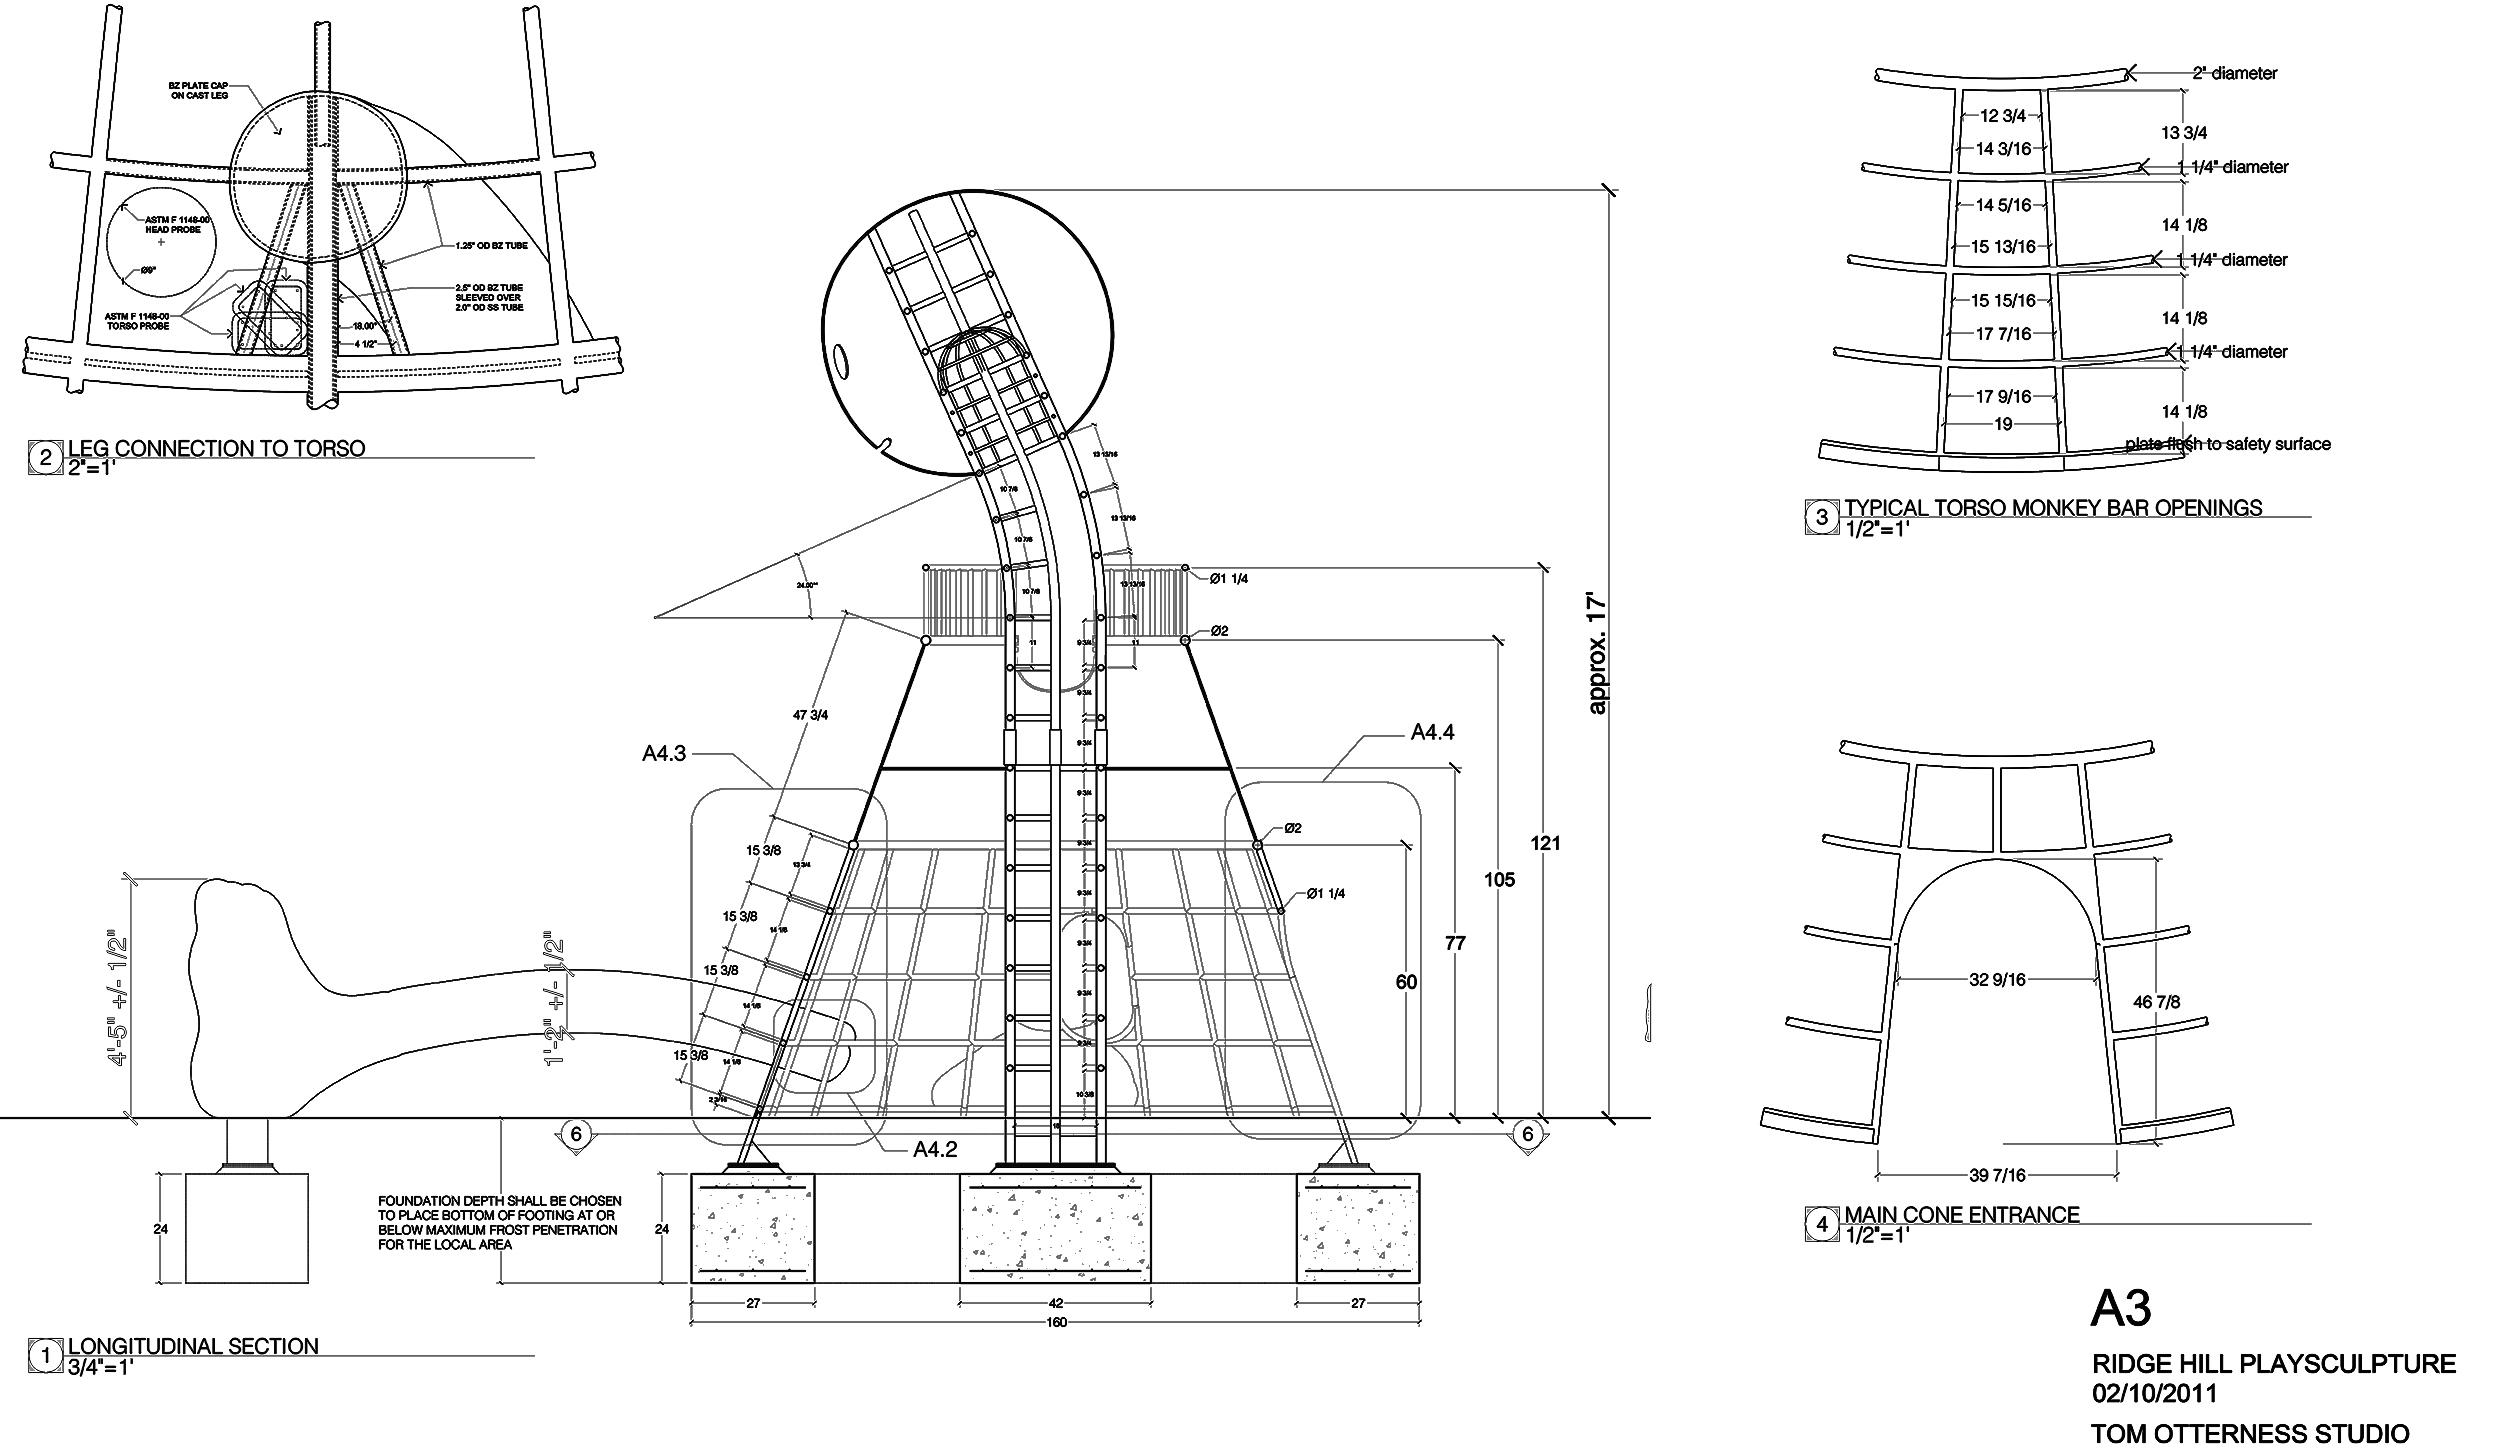 Ridge Hill Playground Structure